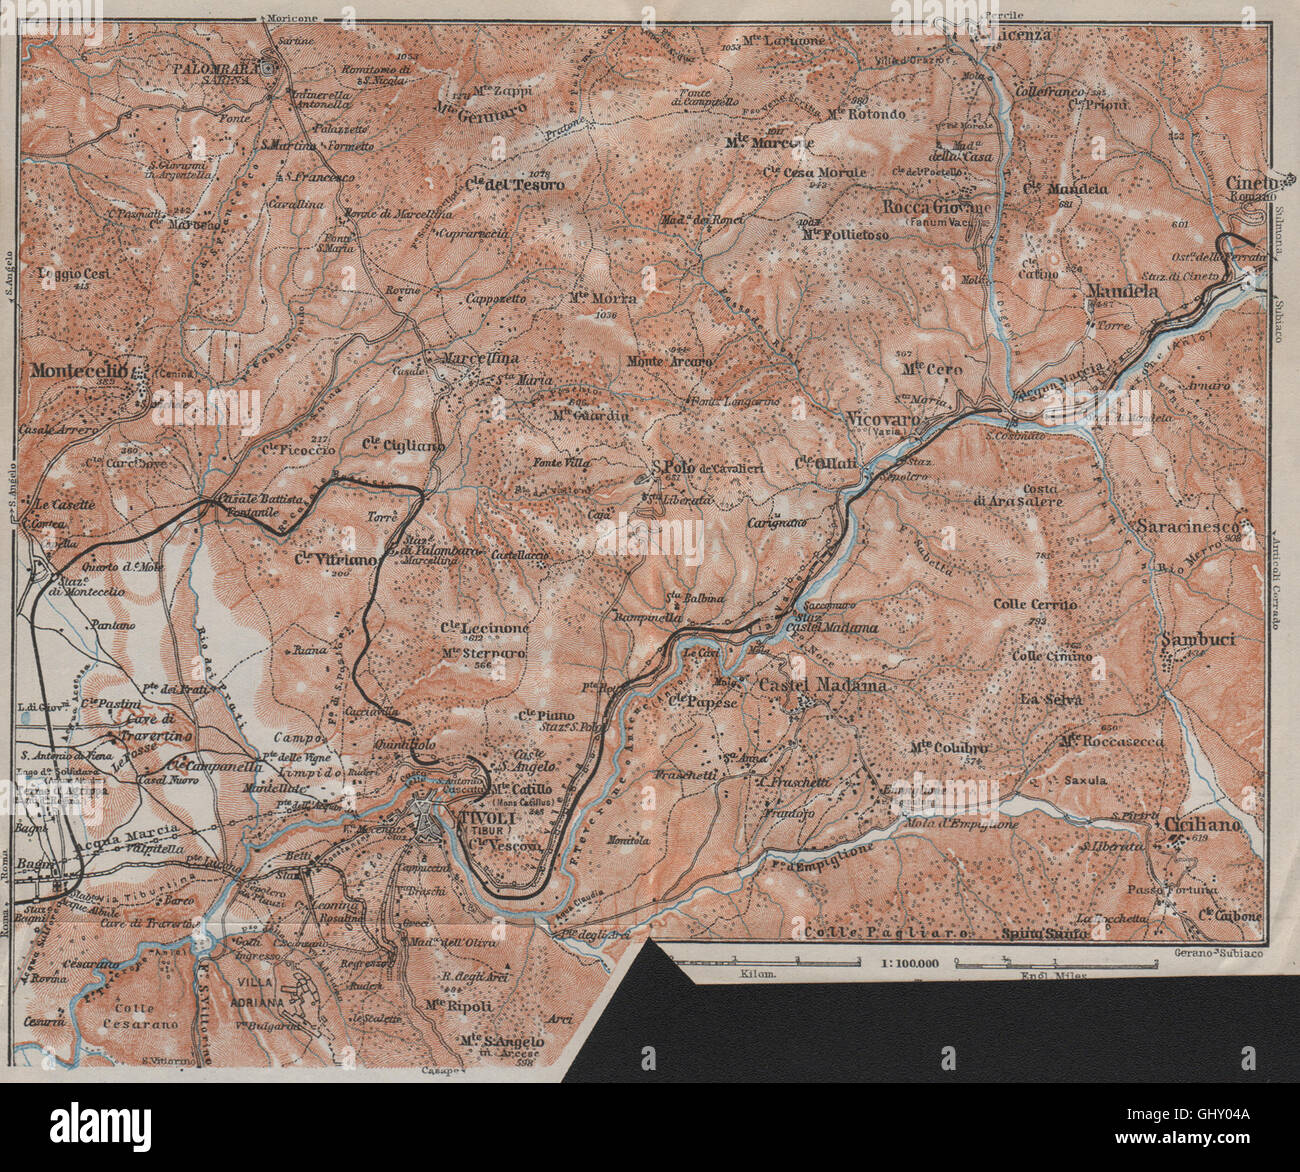 SABINA Tivoli AnieneTeverone river Montcelio topomap Italy mappa